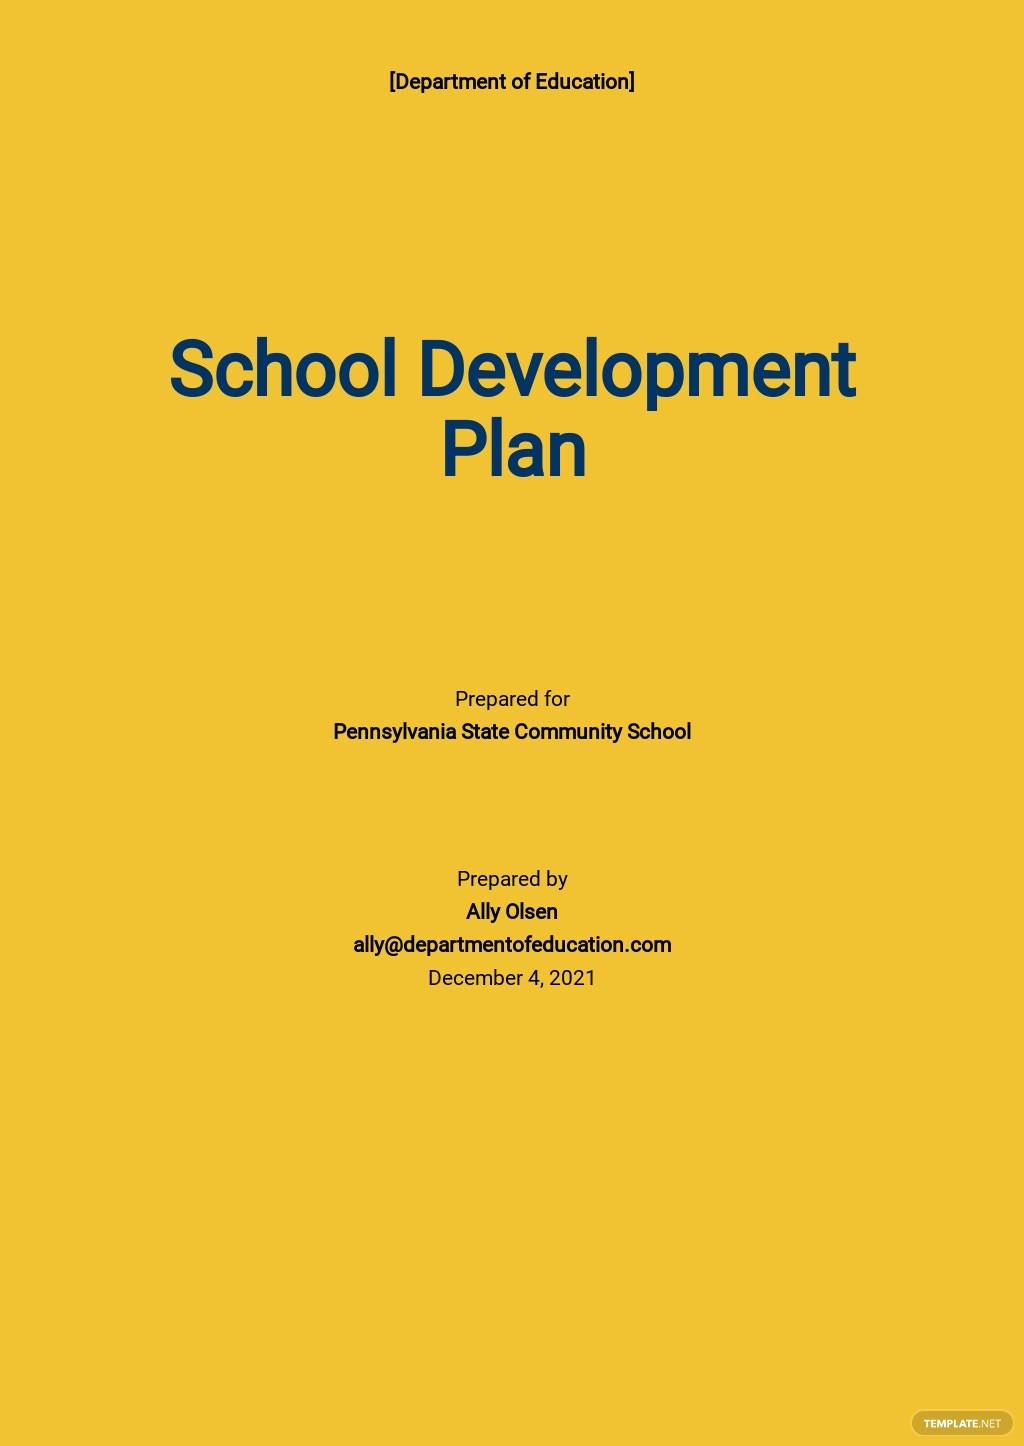 School Development Plan Template.jpe